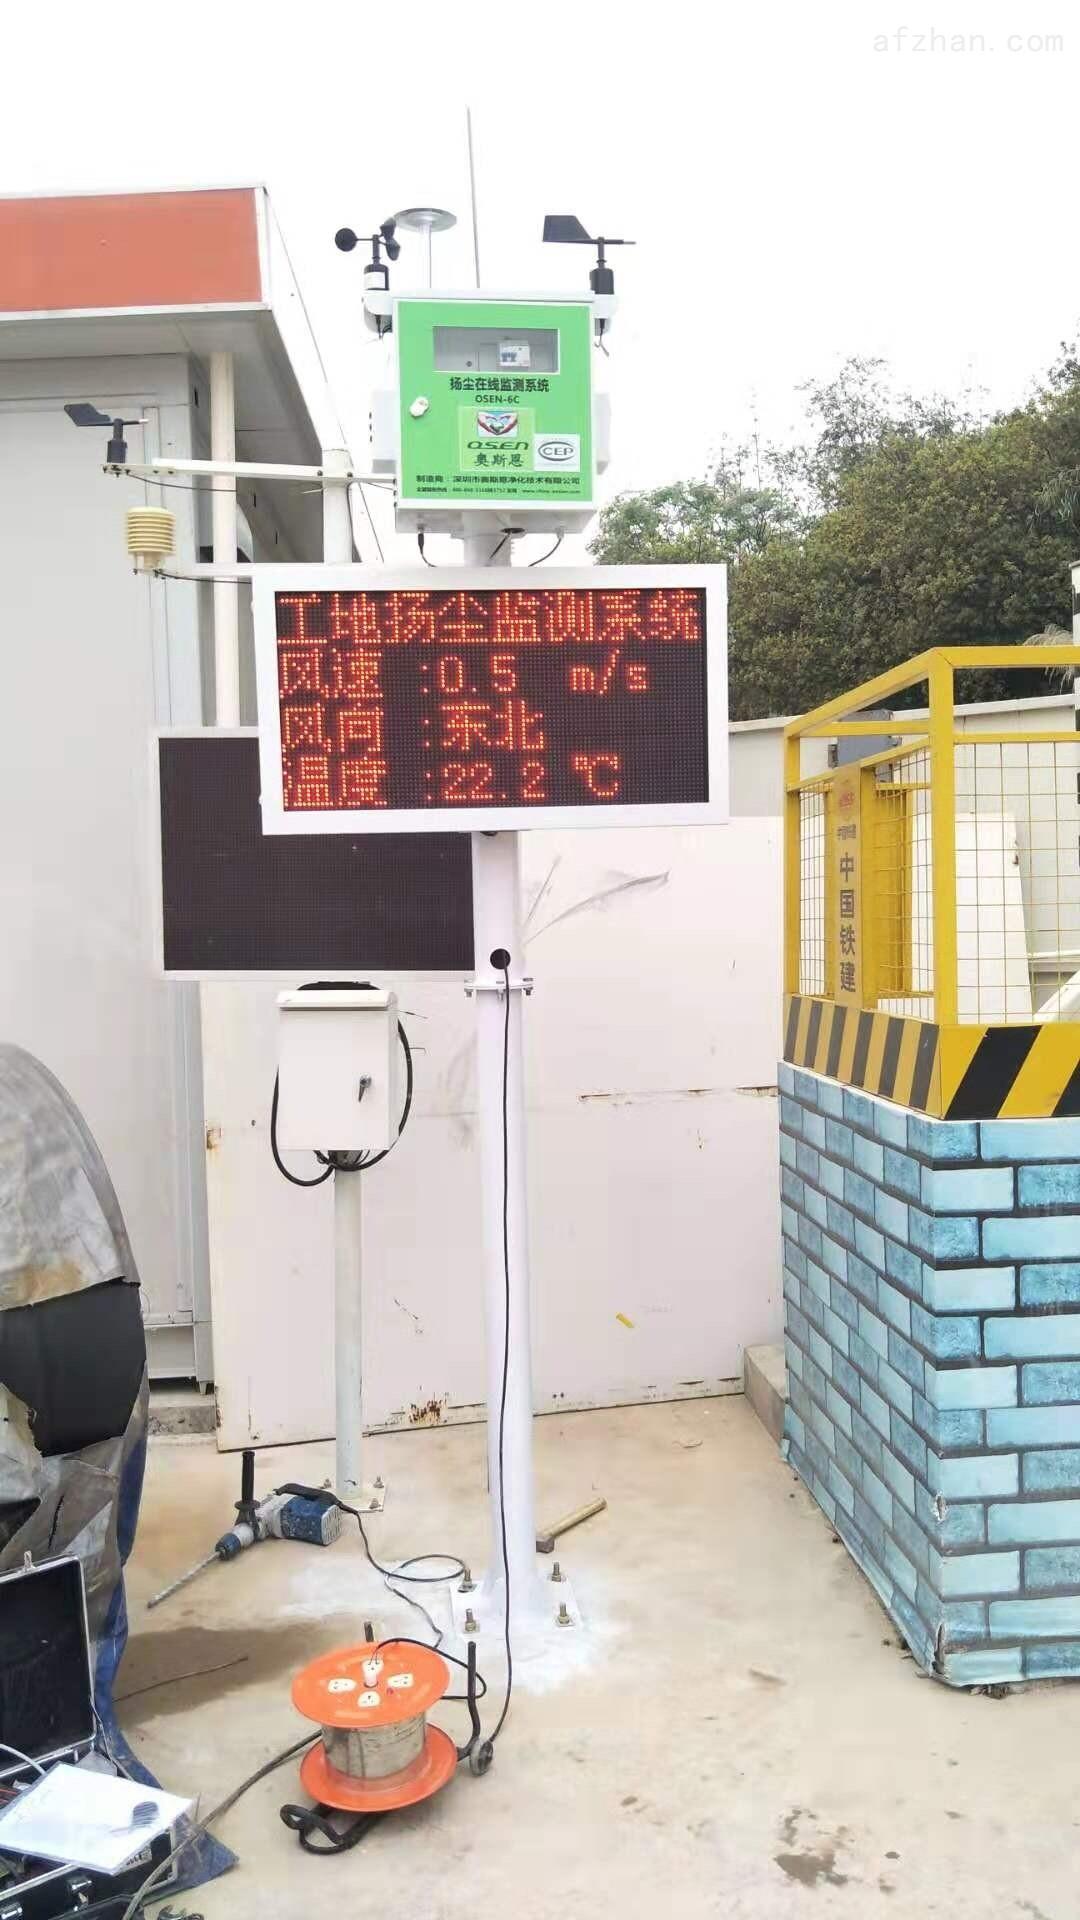 OSEN-6C-广西工地智能扬尘系统